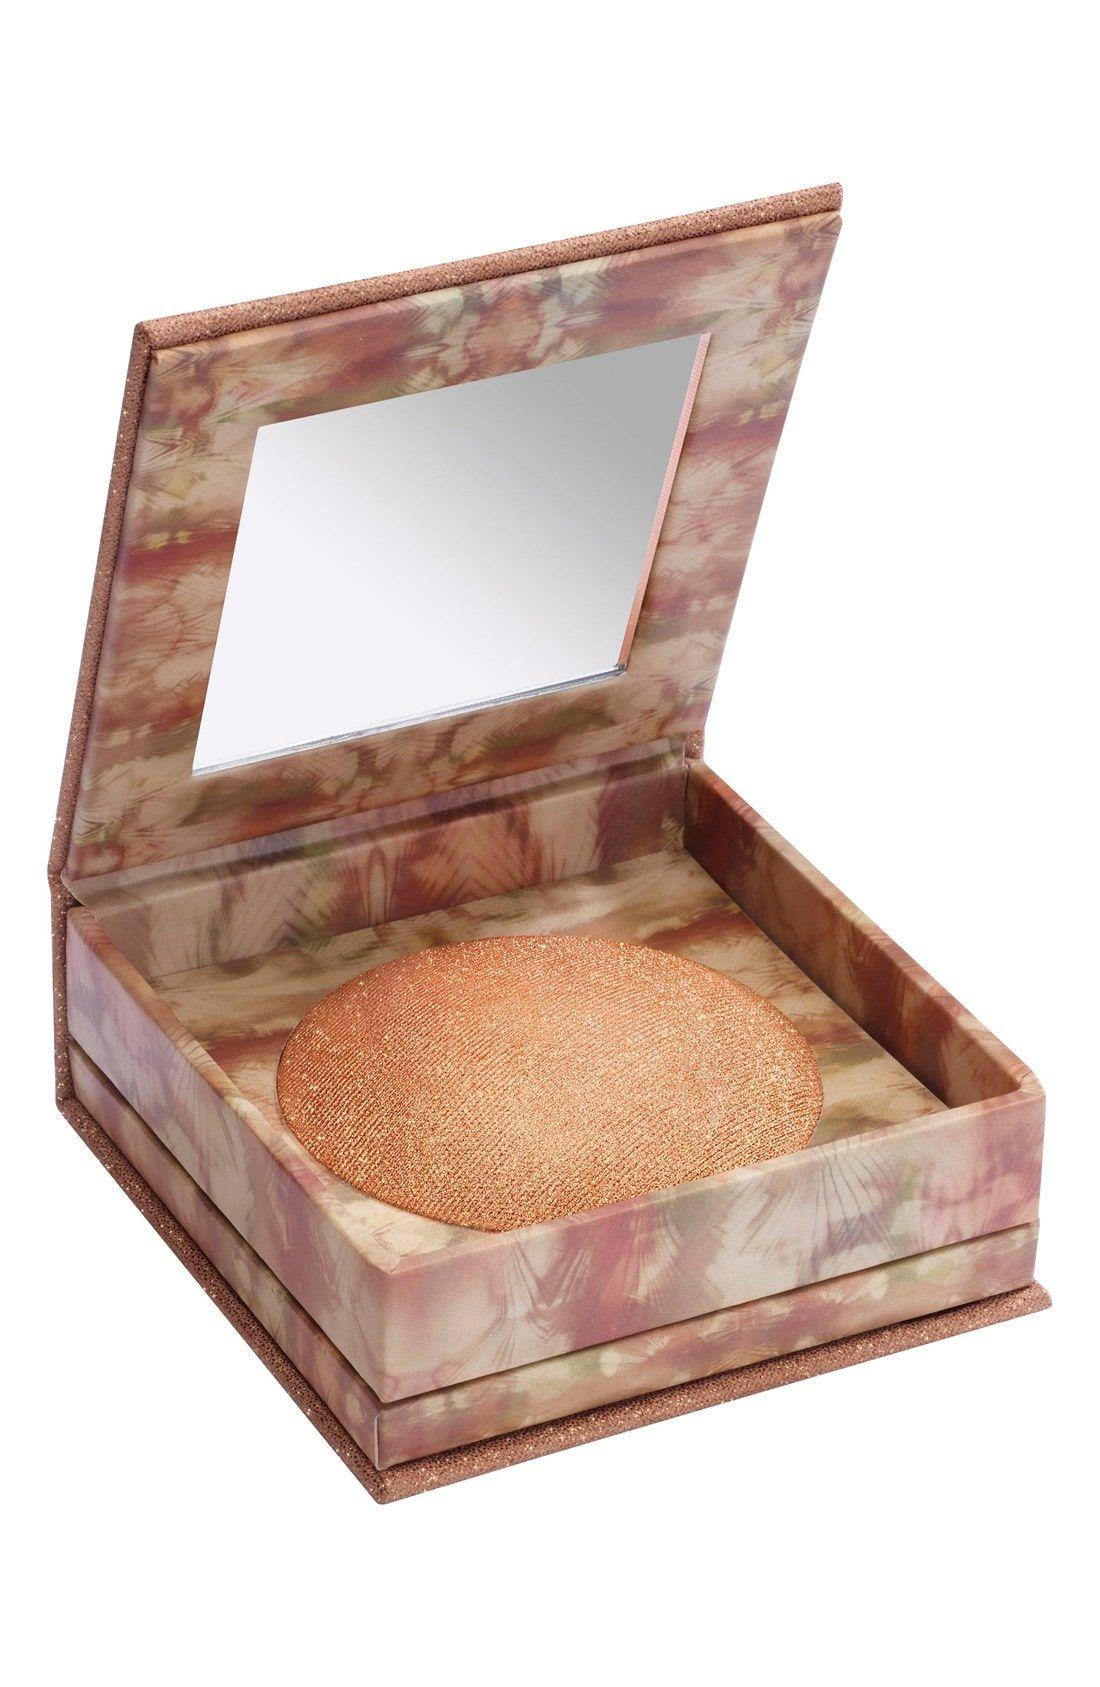 Naked Illuminated Shimmering Powder for Face & Body